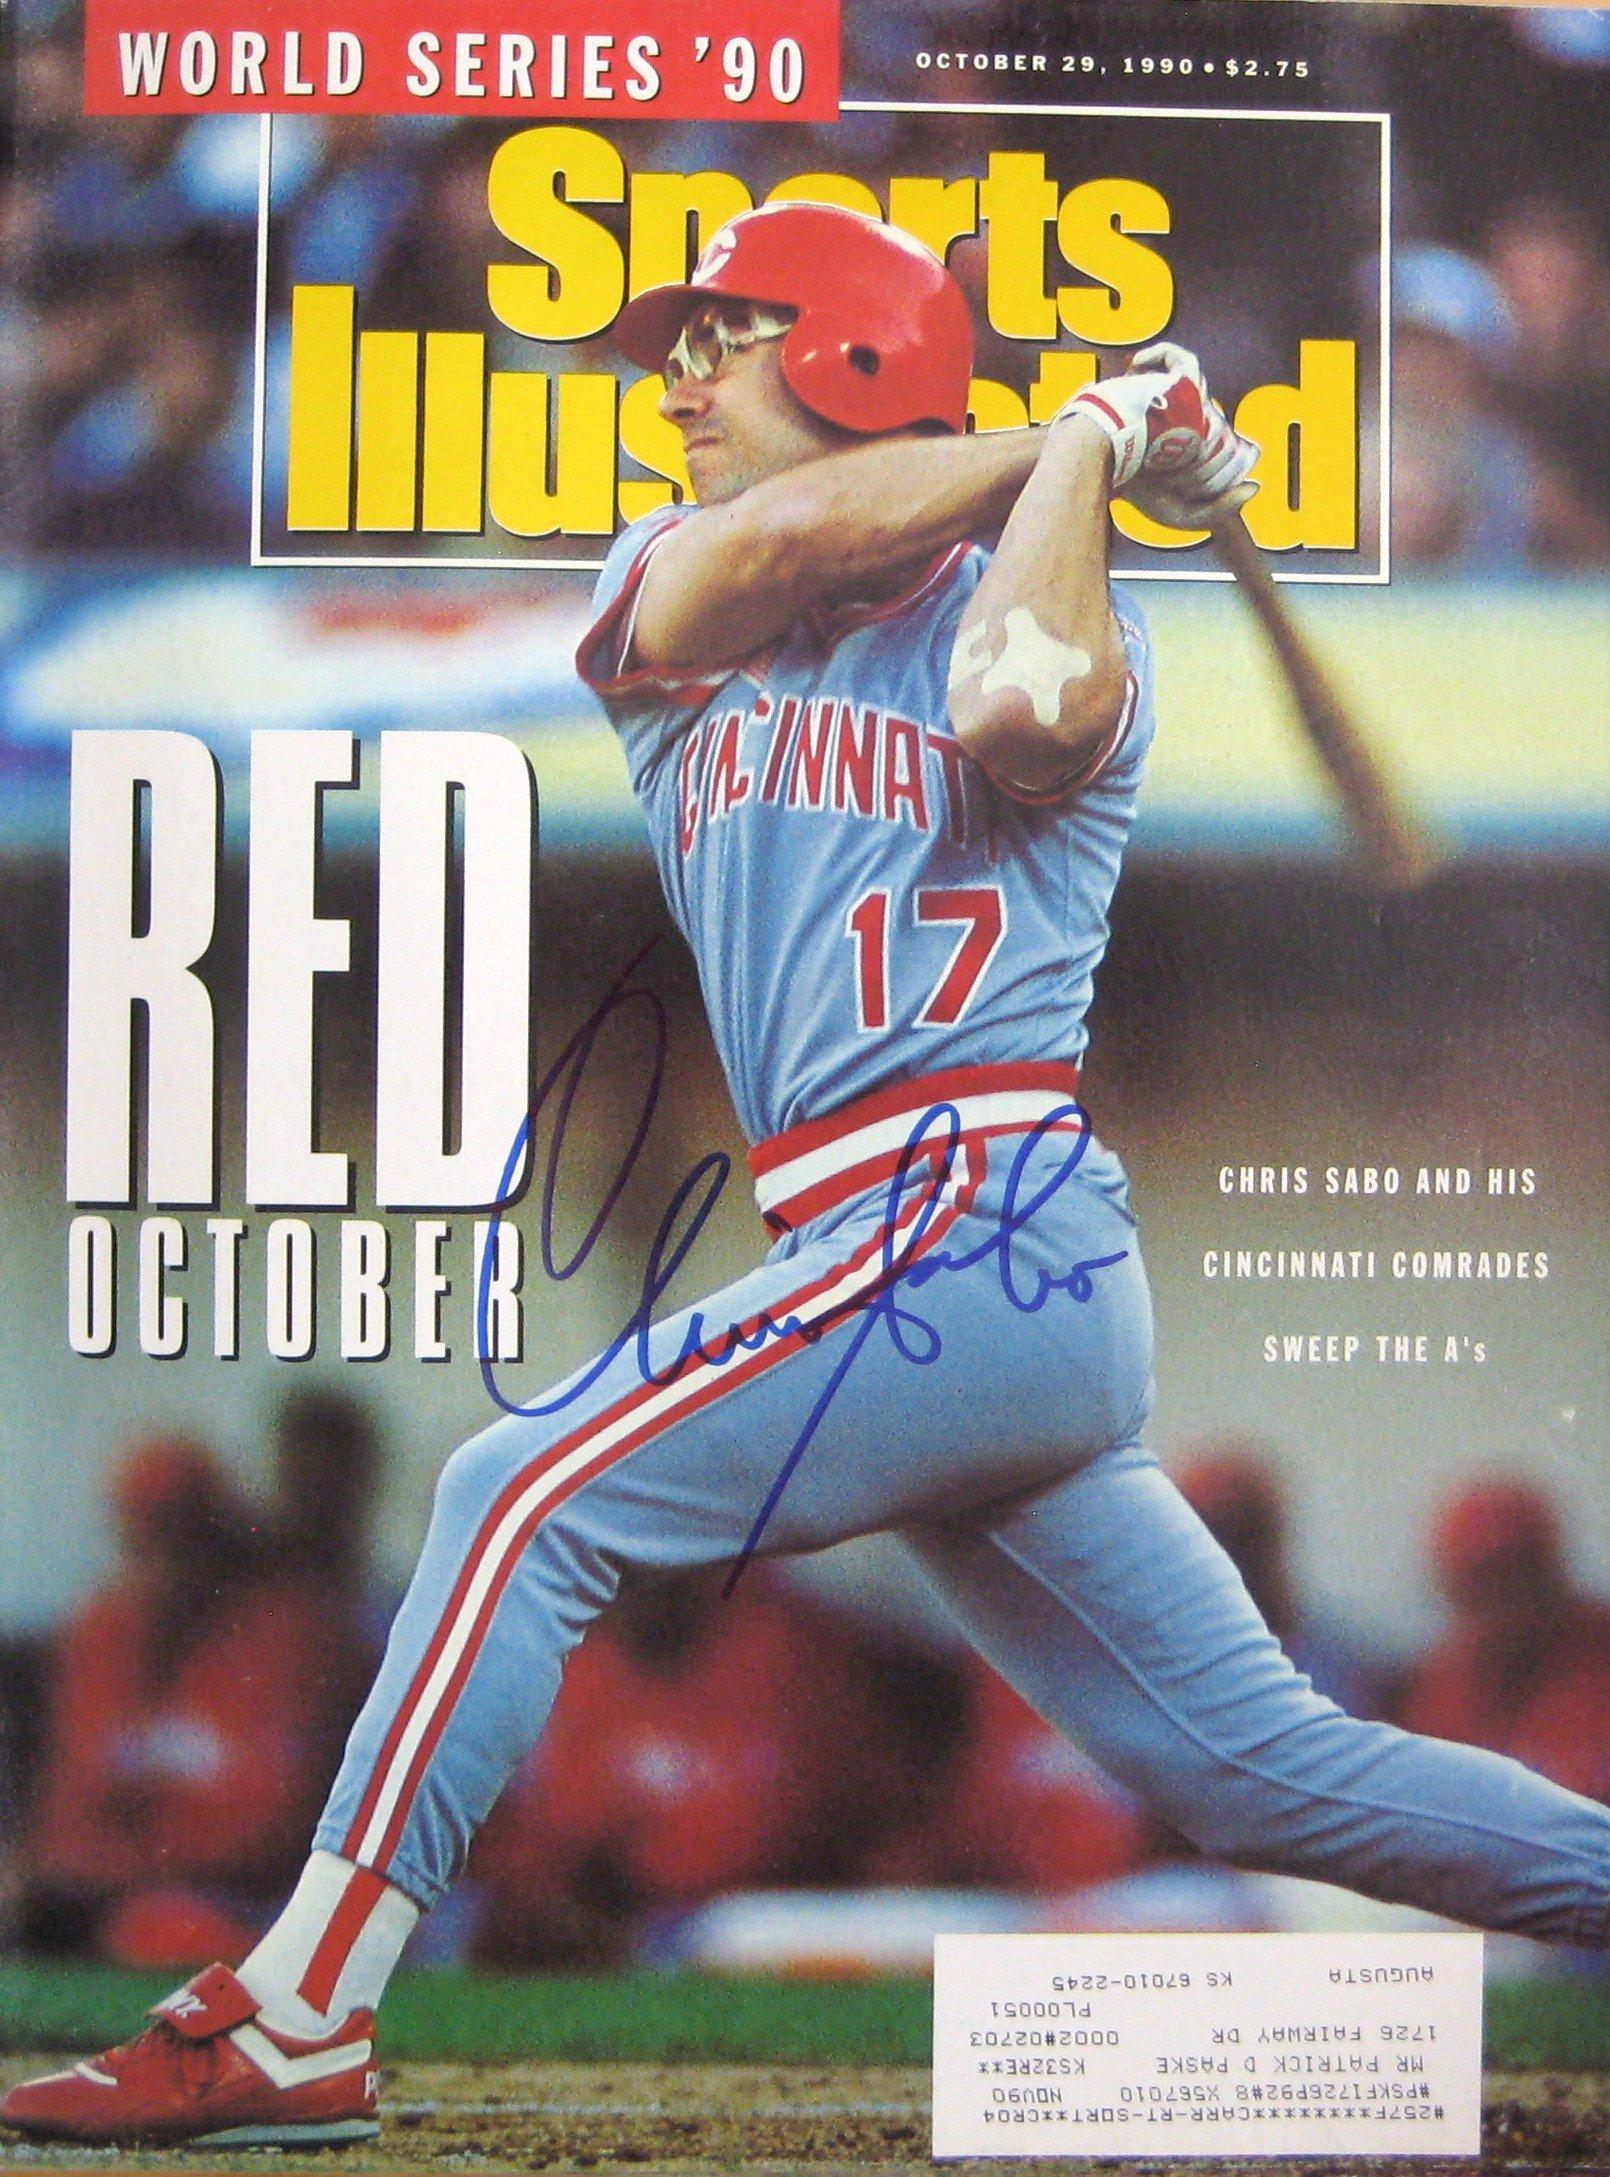 Sabo, Chris 10/29/90 autographed magazine